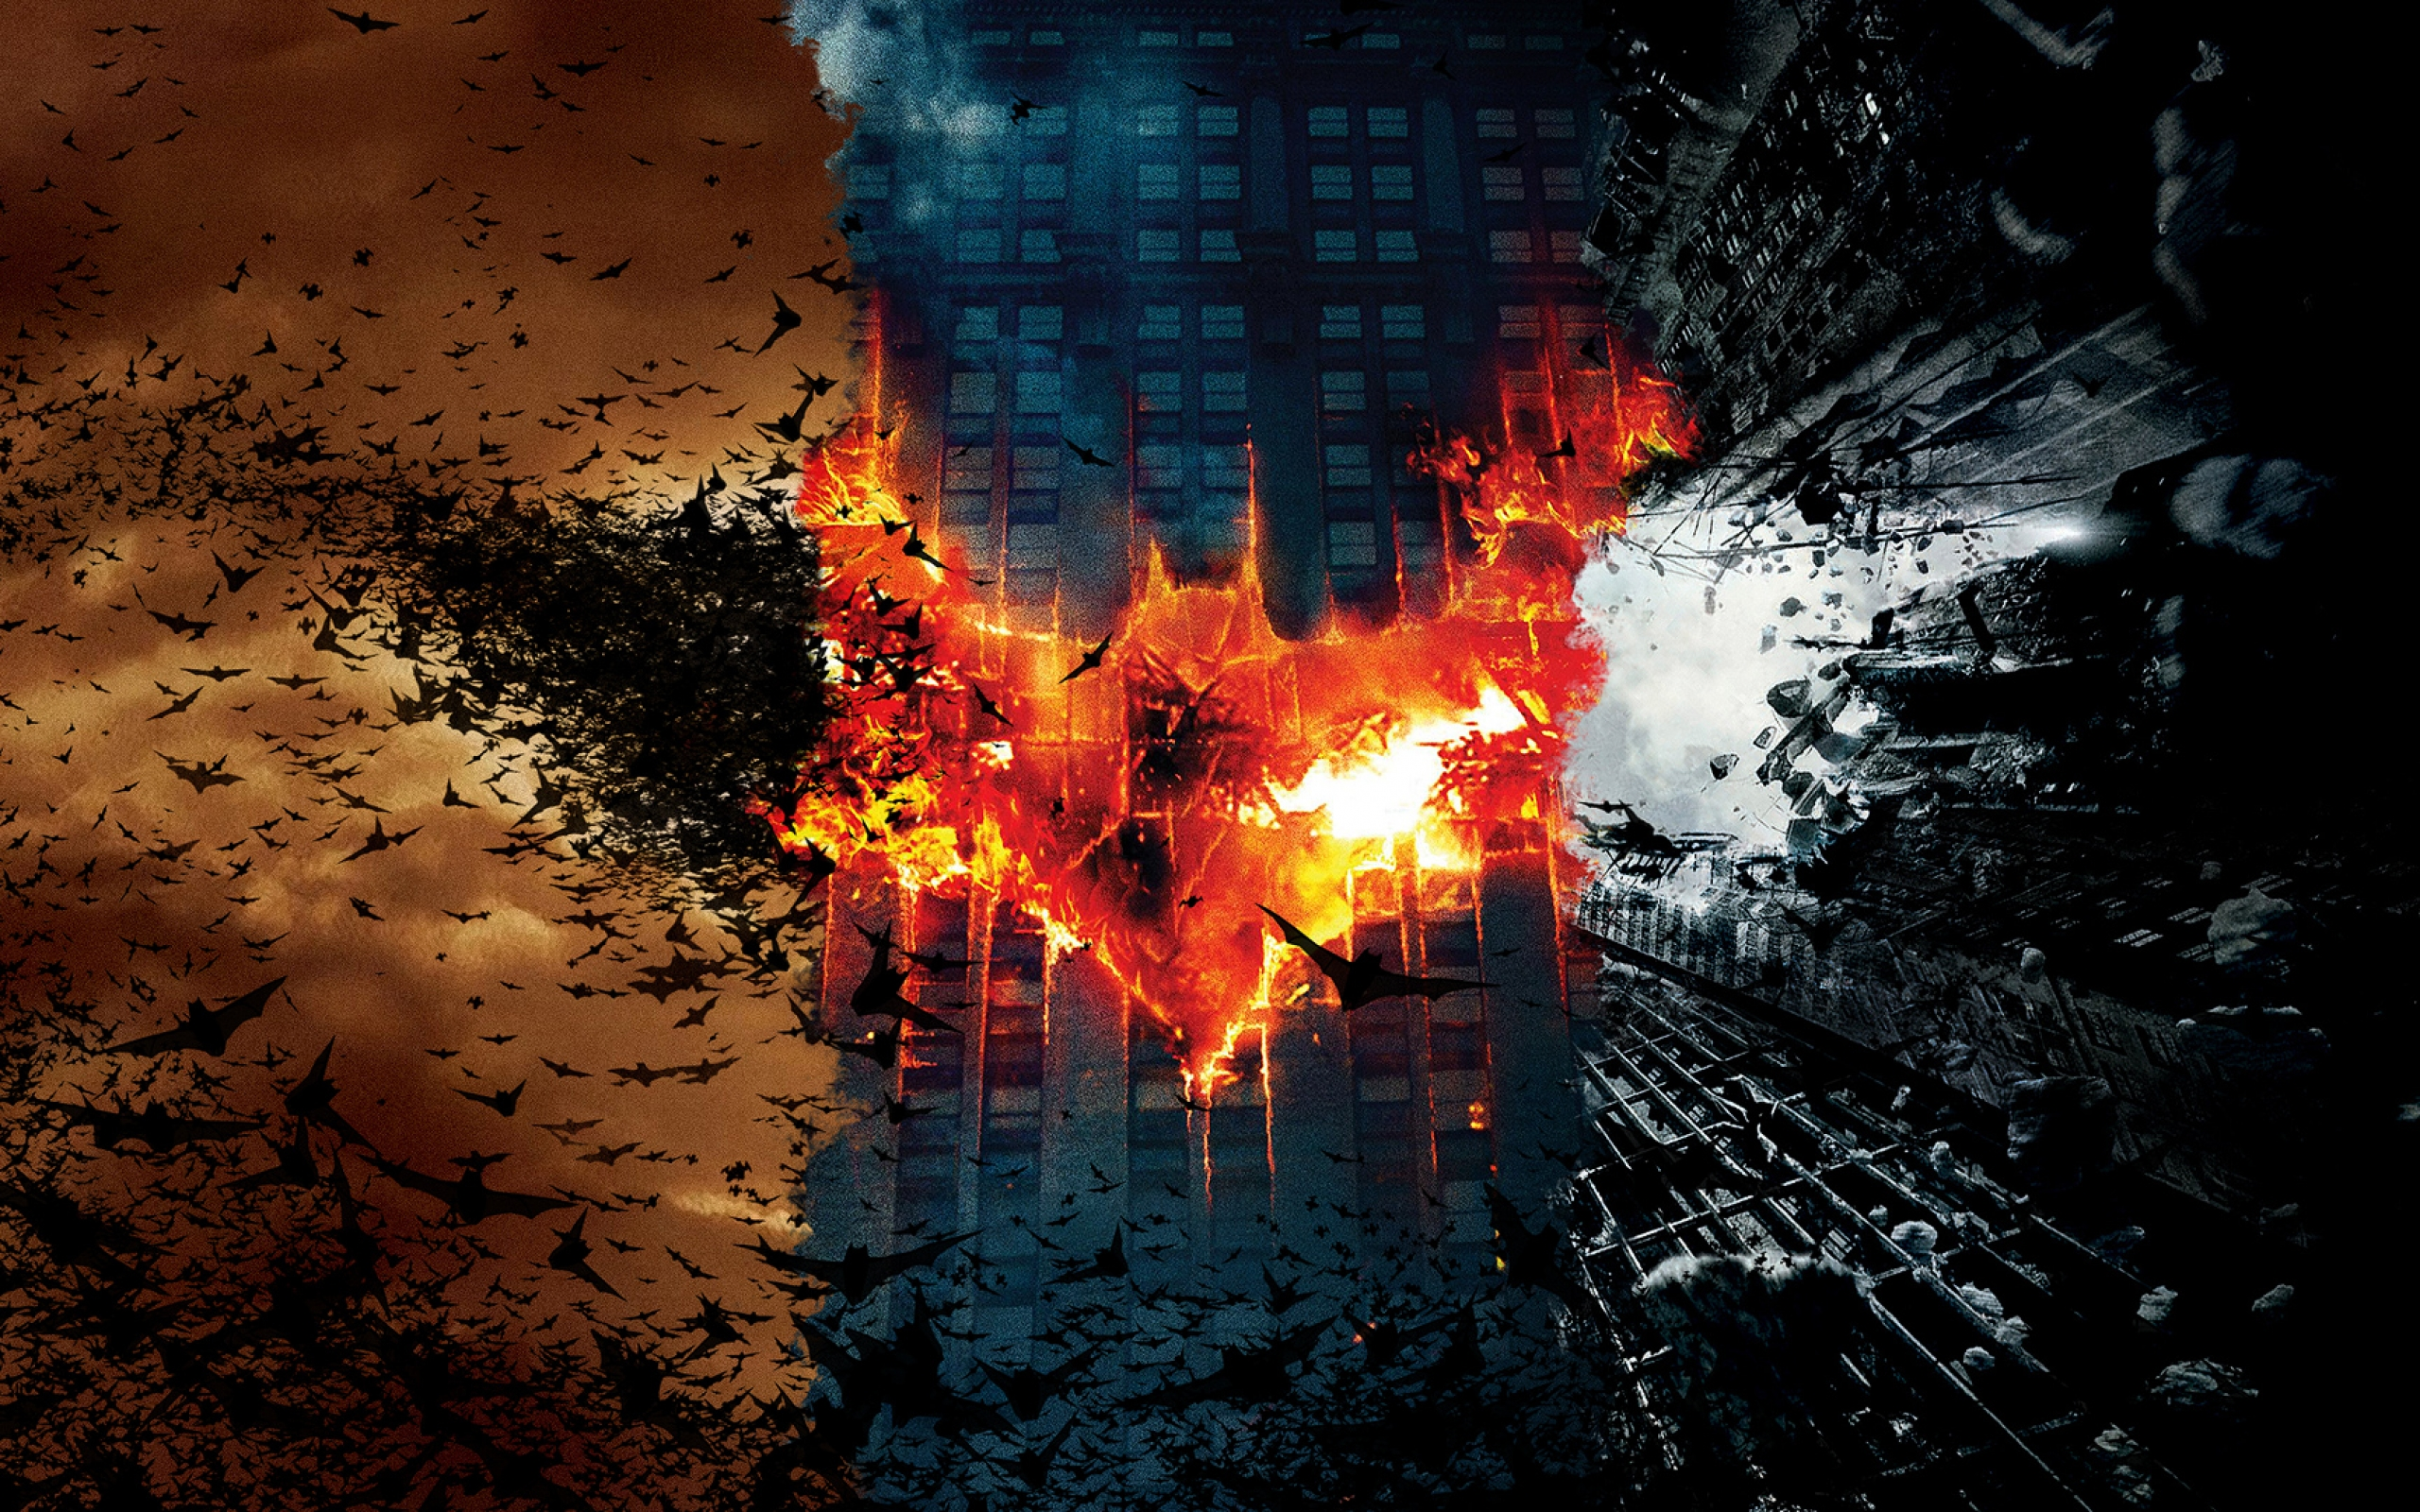 Batman Dark Knight Trilogy Wallpapers HD Wallpapers 2560x1600